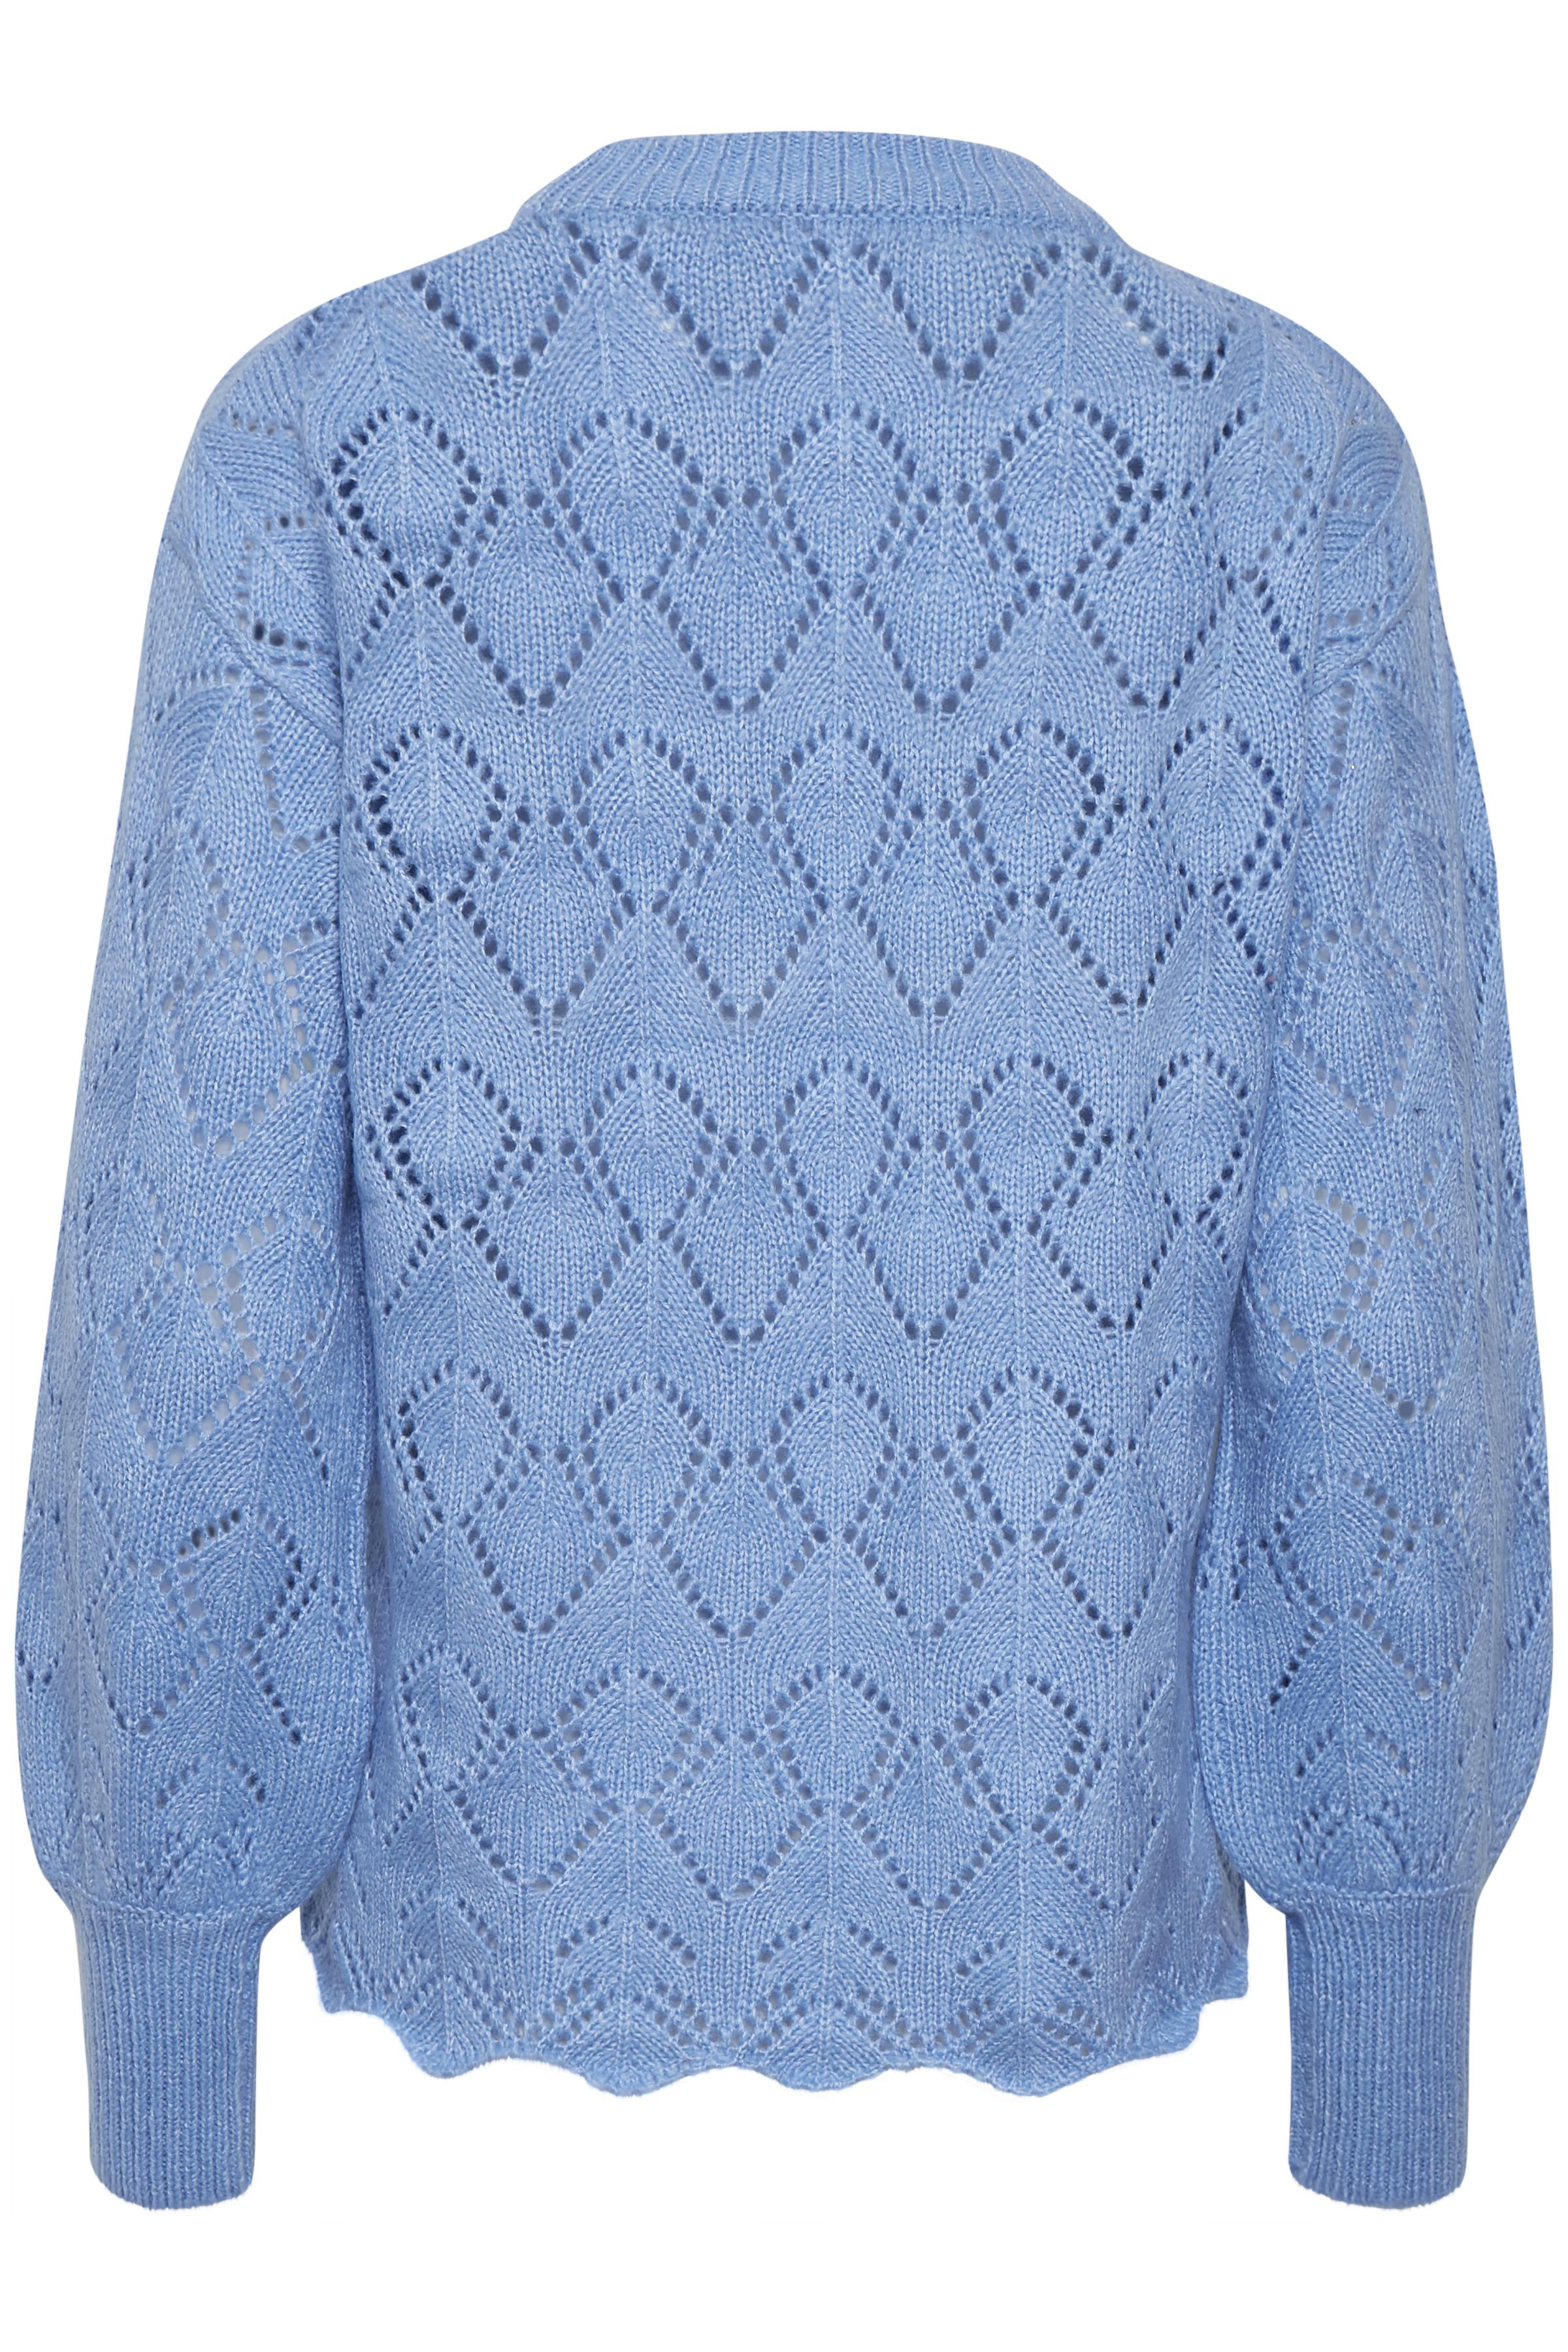 Cornflower Blue Mel. Pullover van b.young – Koop Cornflower Blue Mel. Pullover hier van size XS-XXL